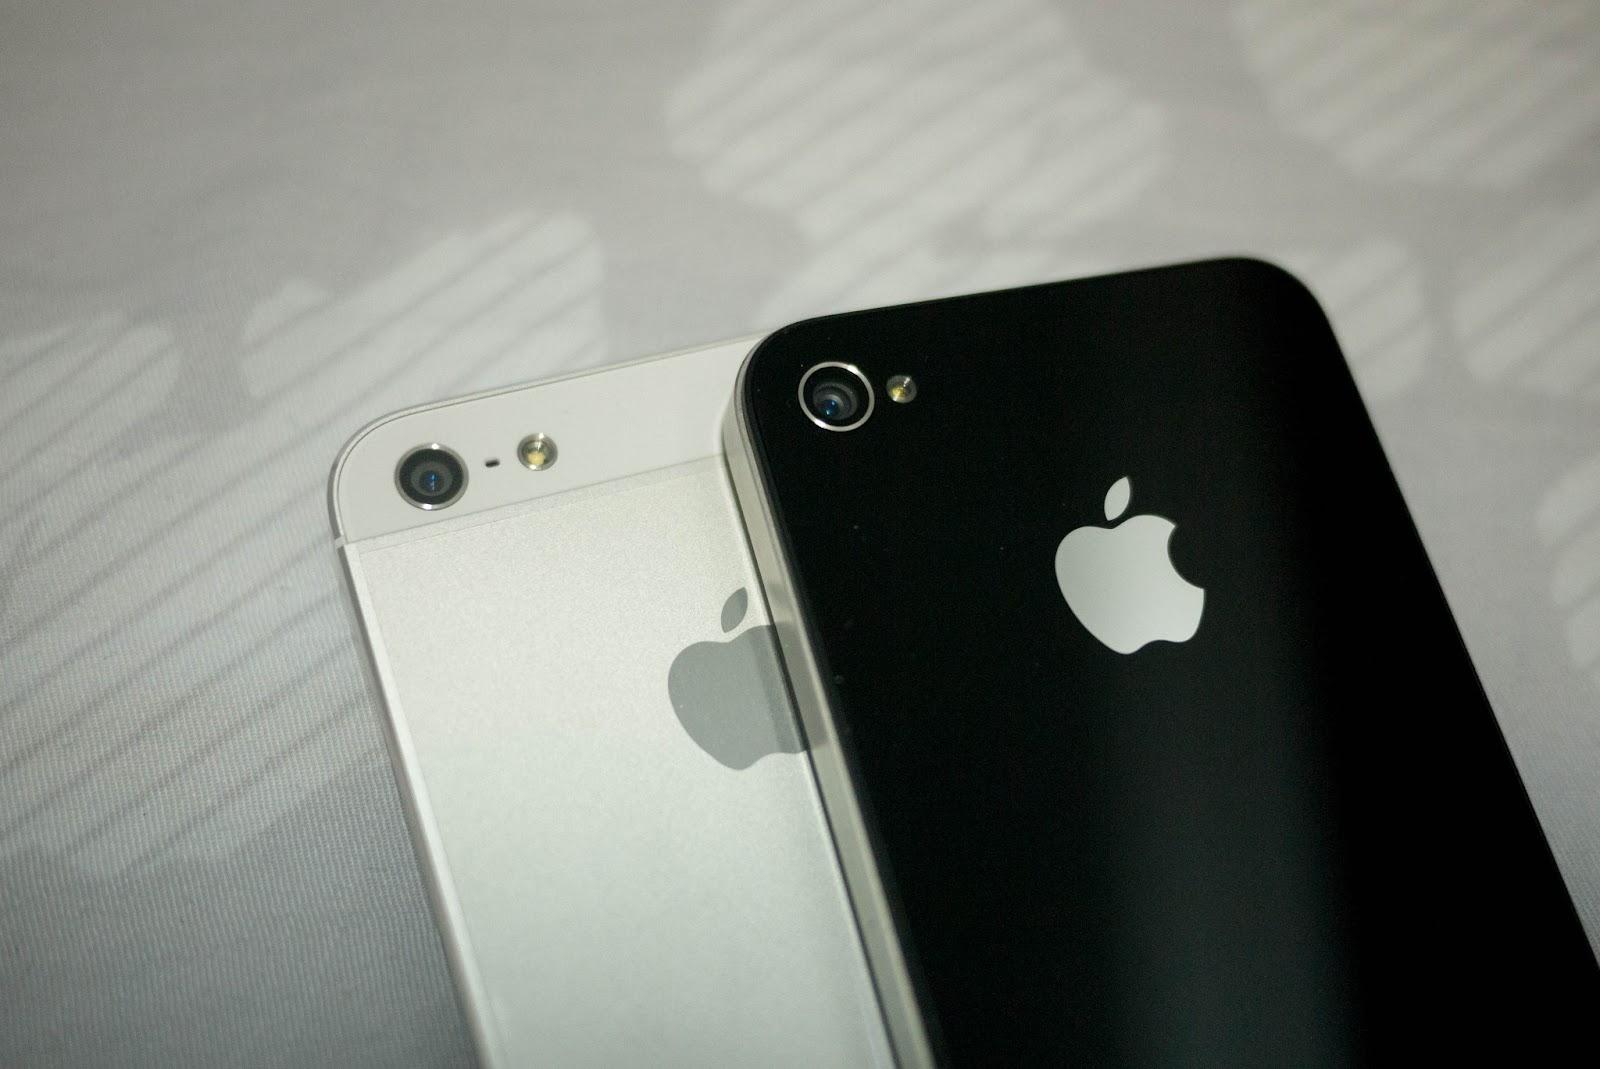 PrincessQ: 【敗】iPhone 5 開箱文